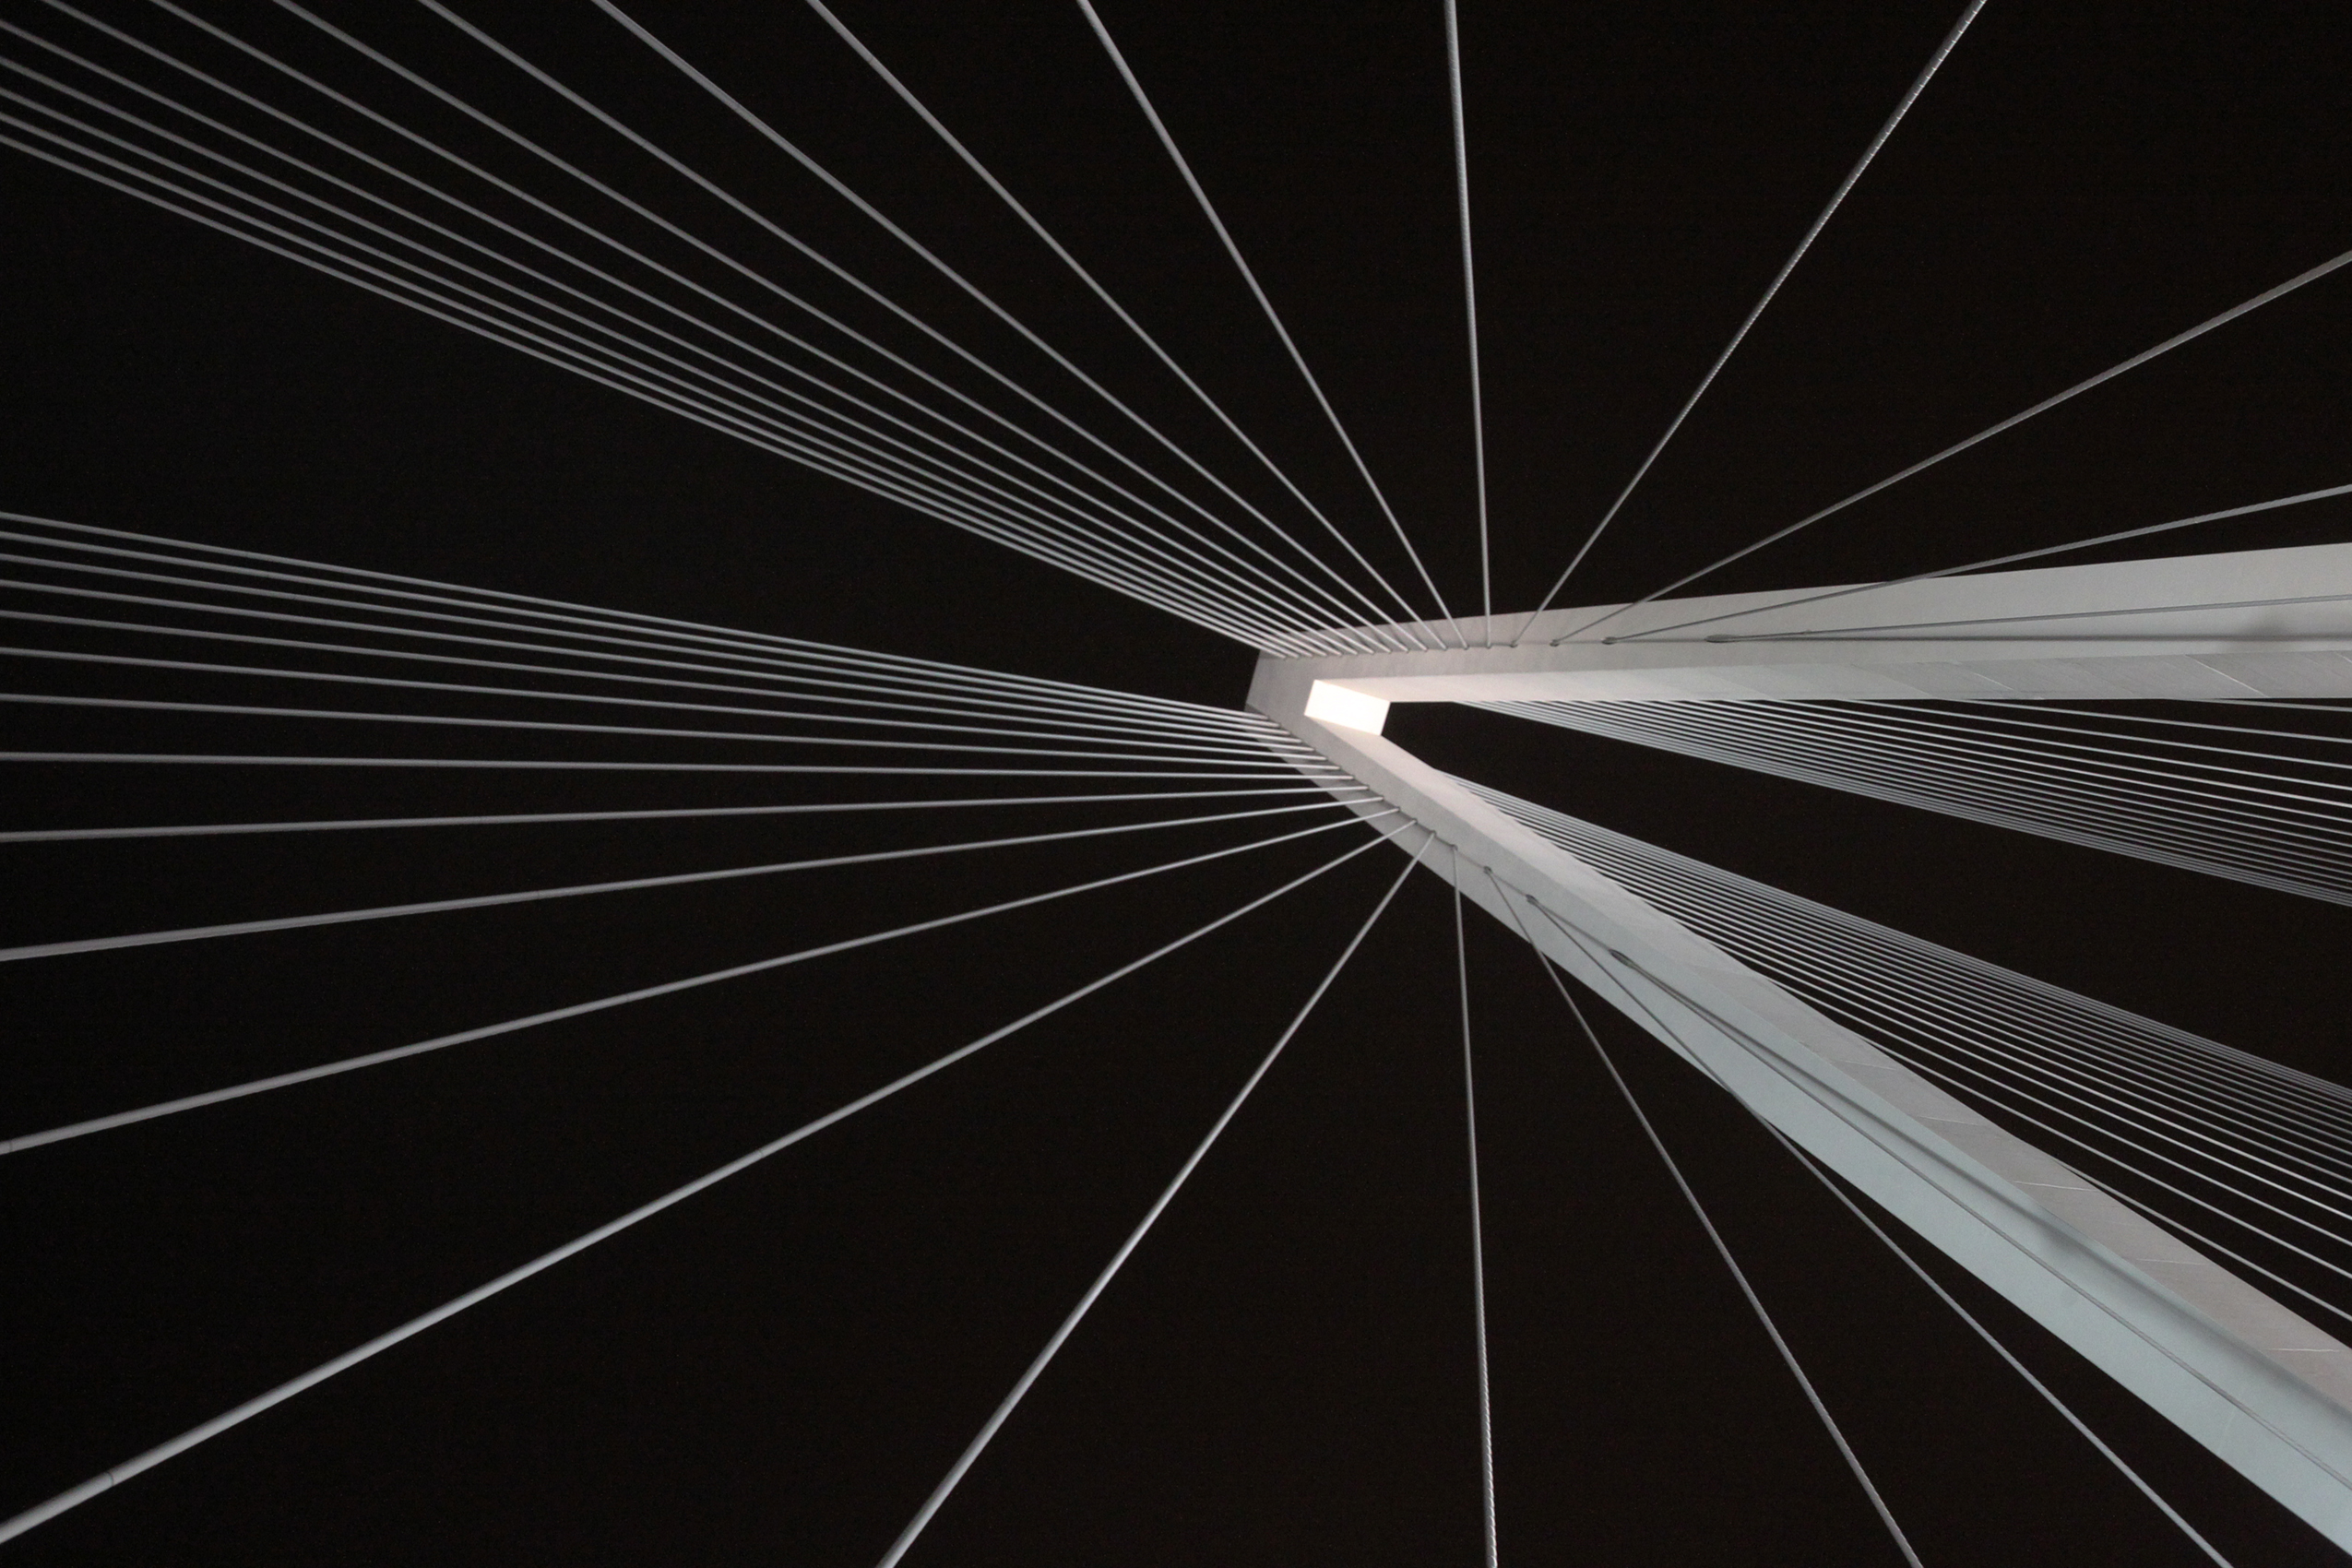 020714DH+art+bridge